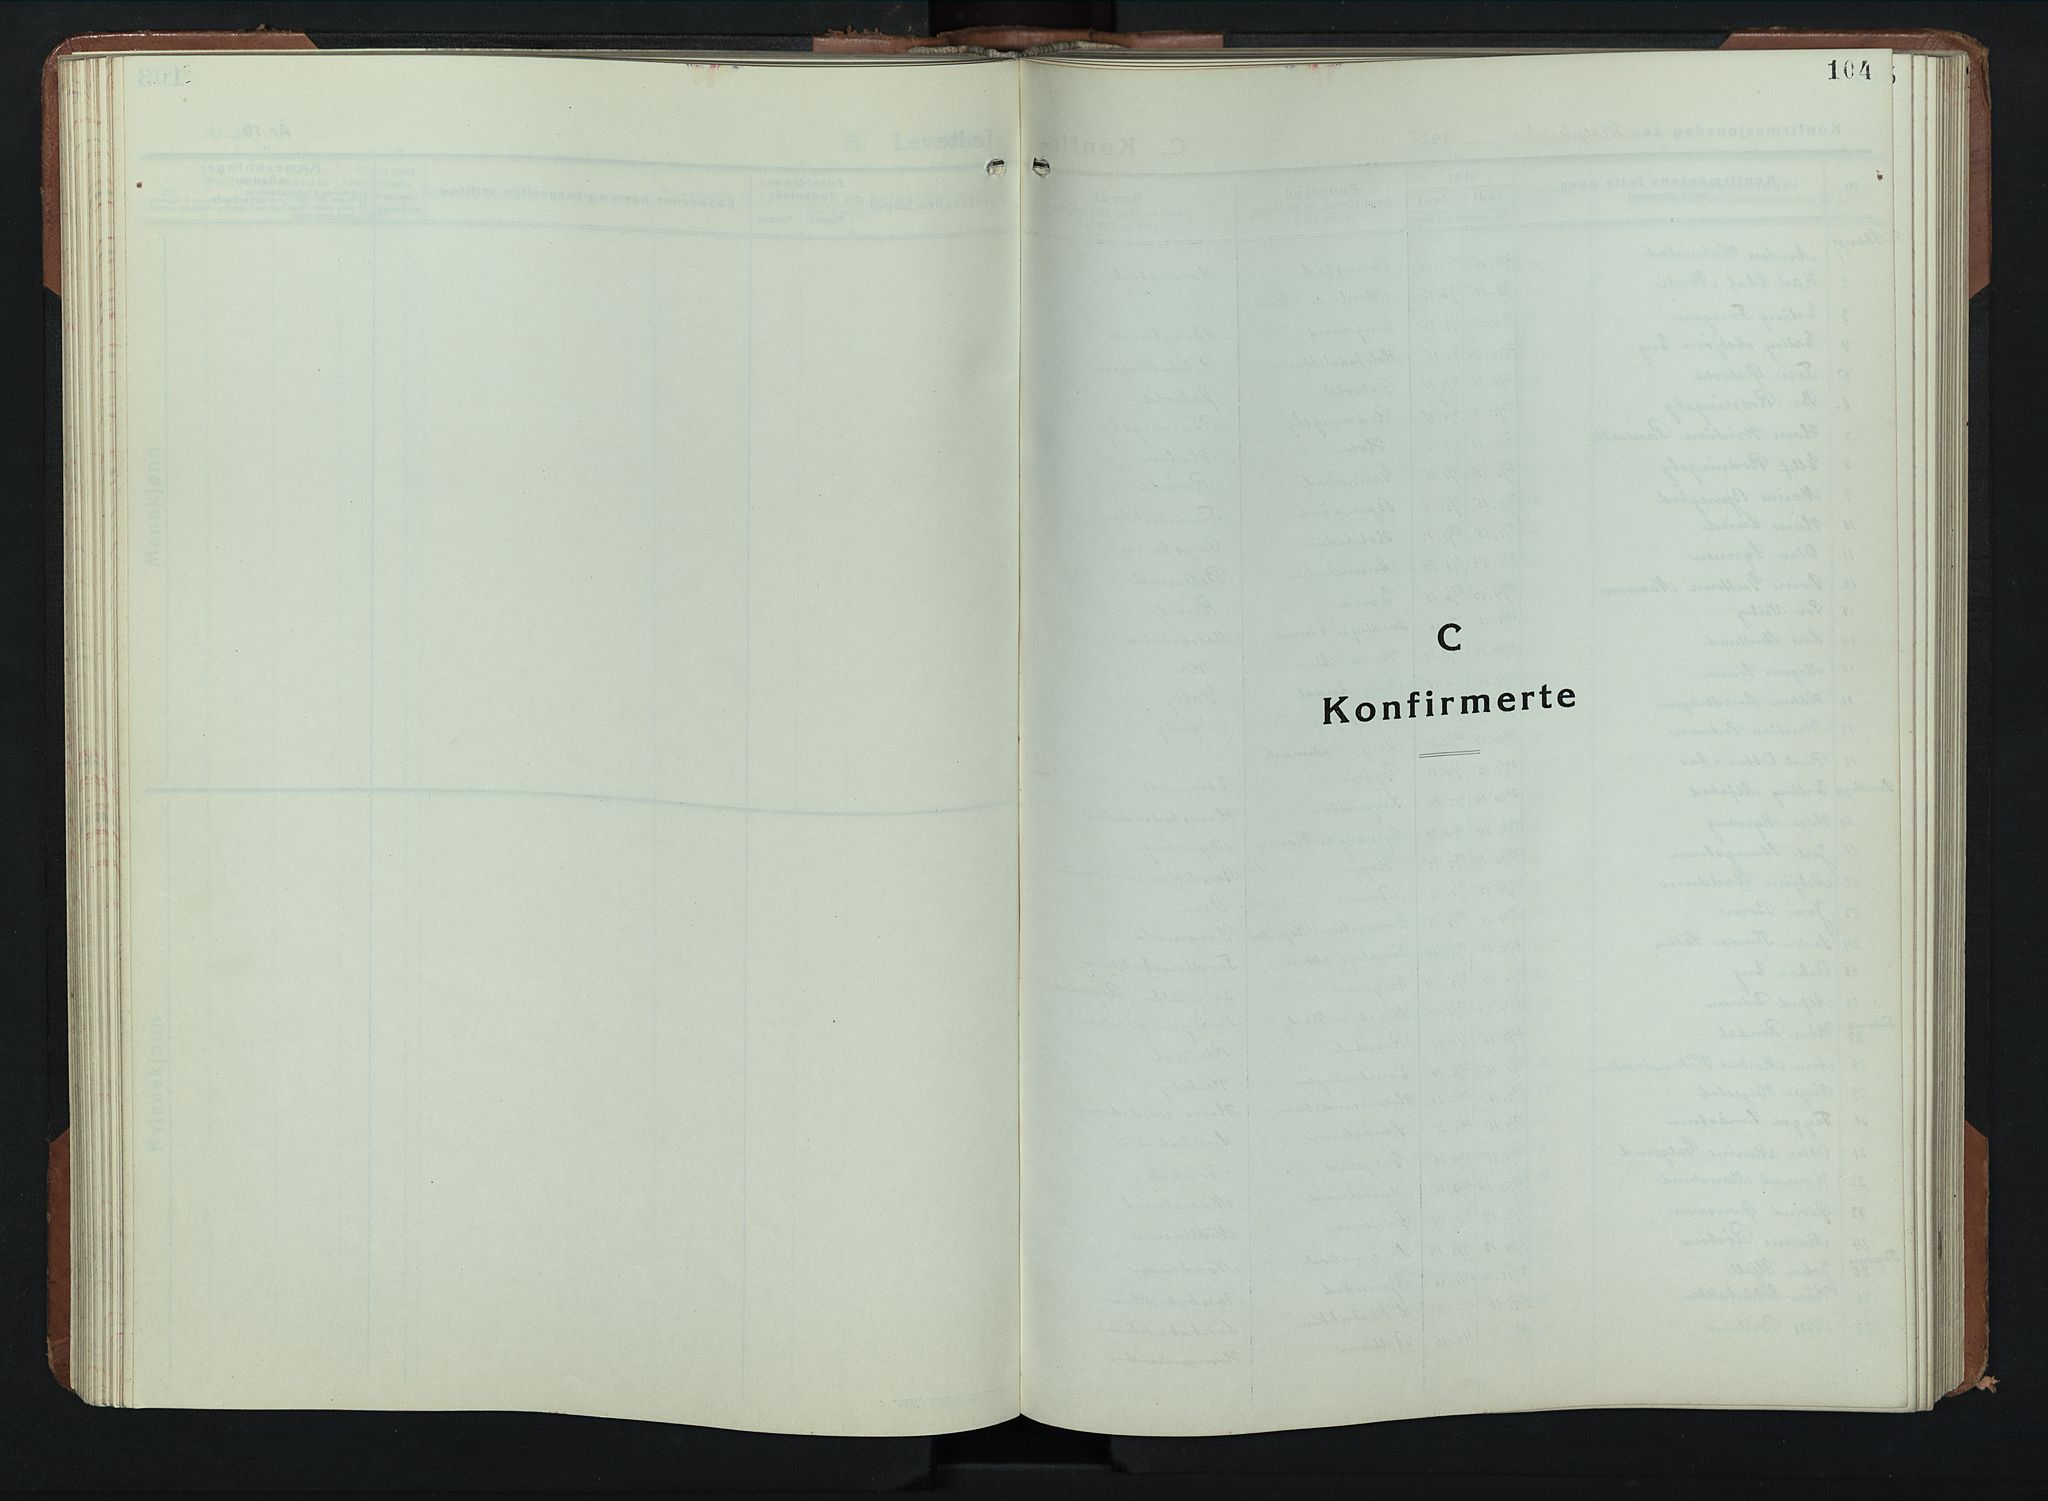 SAH, Balke prestekontor, Klokkerbok nr. 2, 1929-1951, s. 104